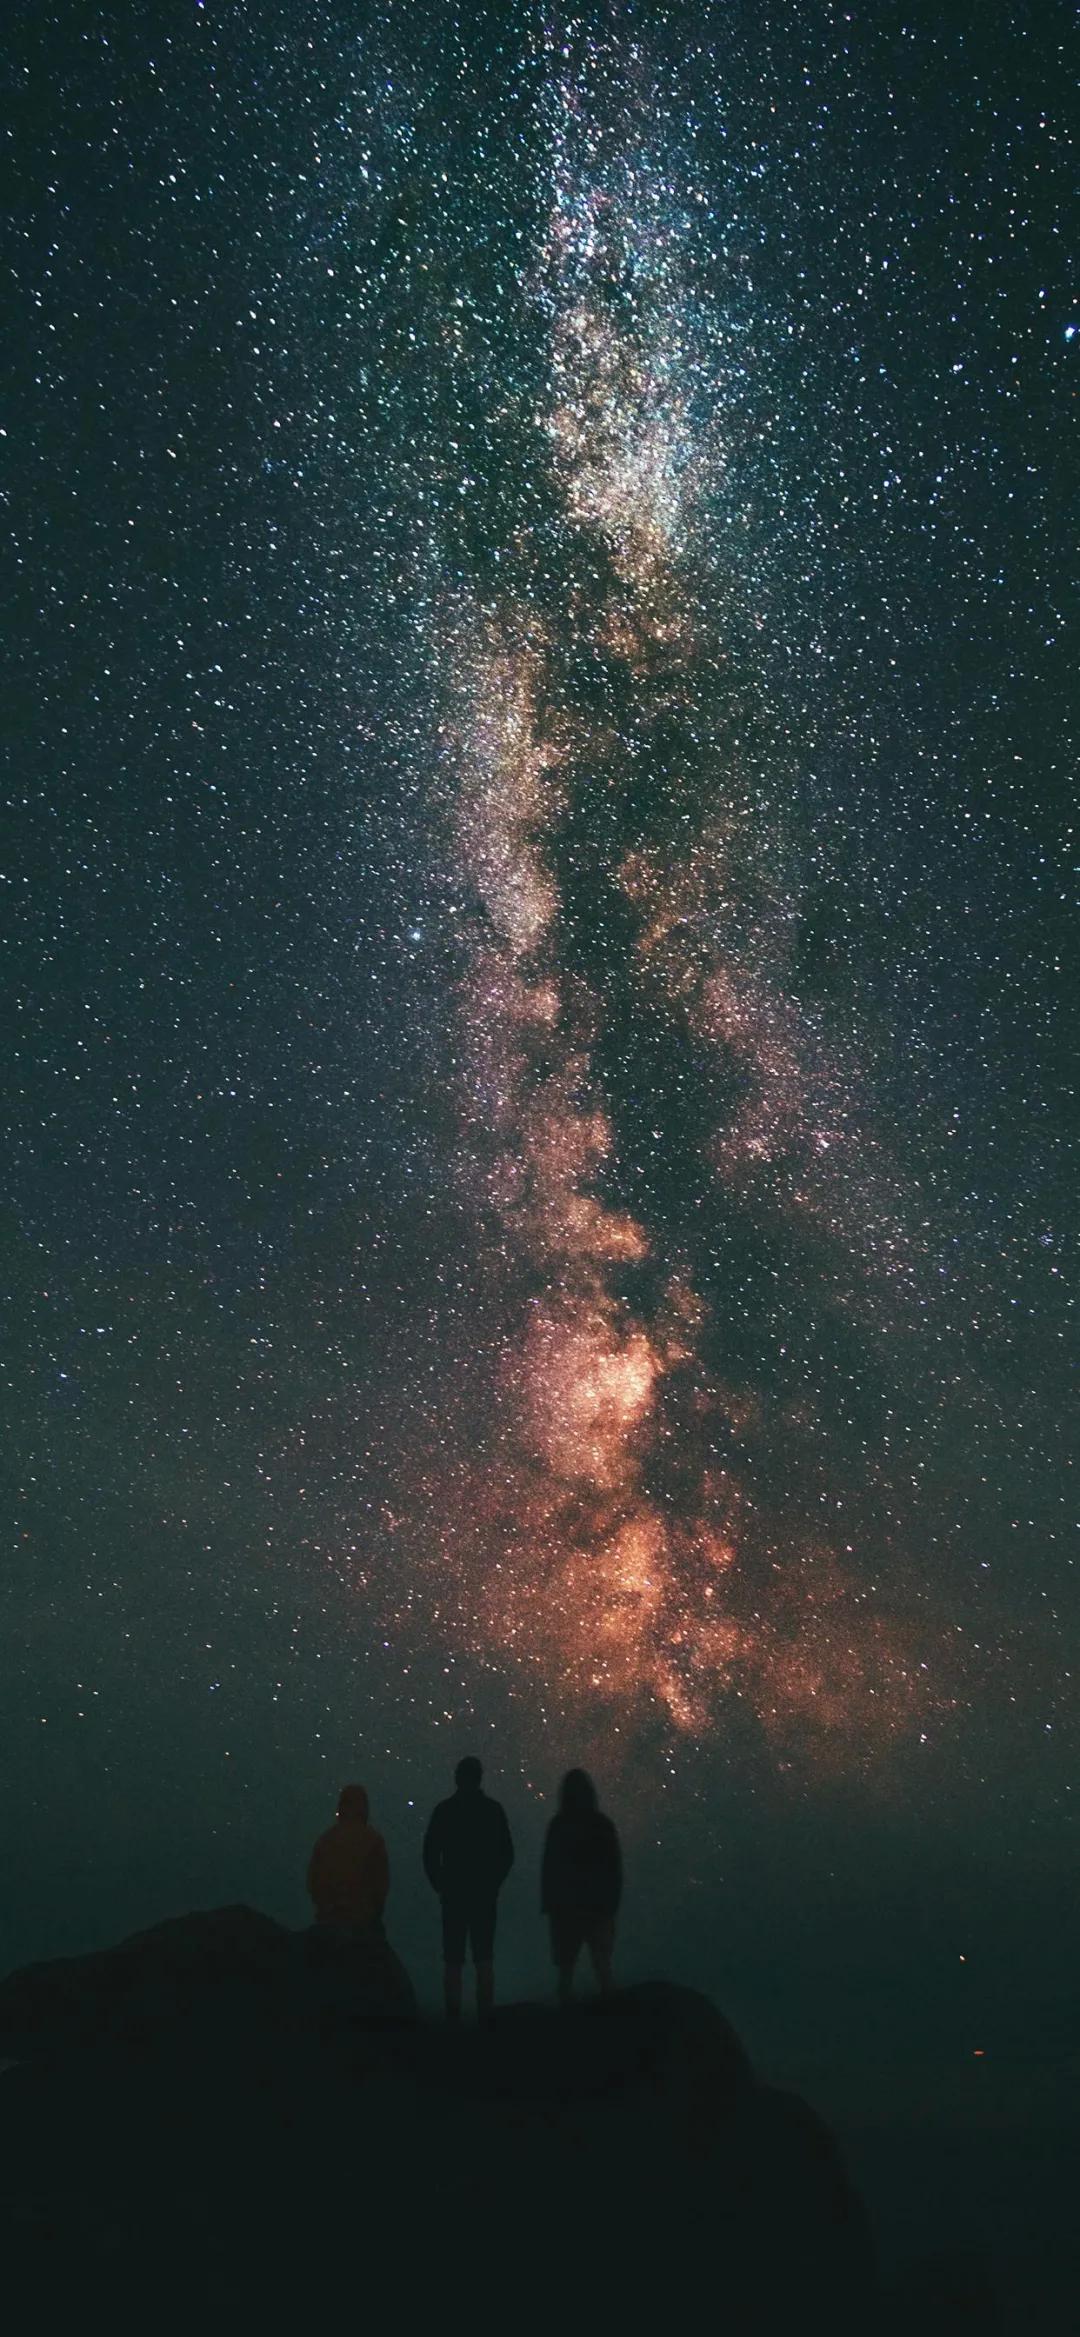 超美夜空星空全屏手机壁纸